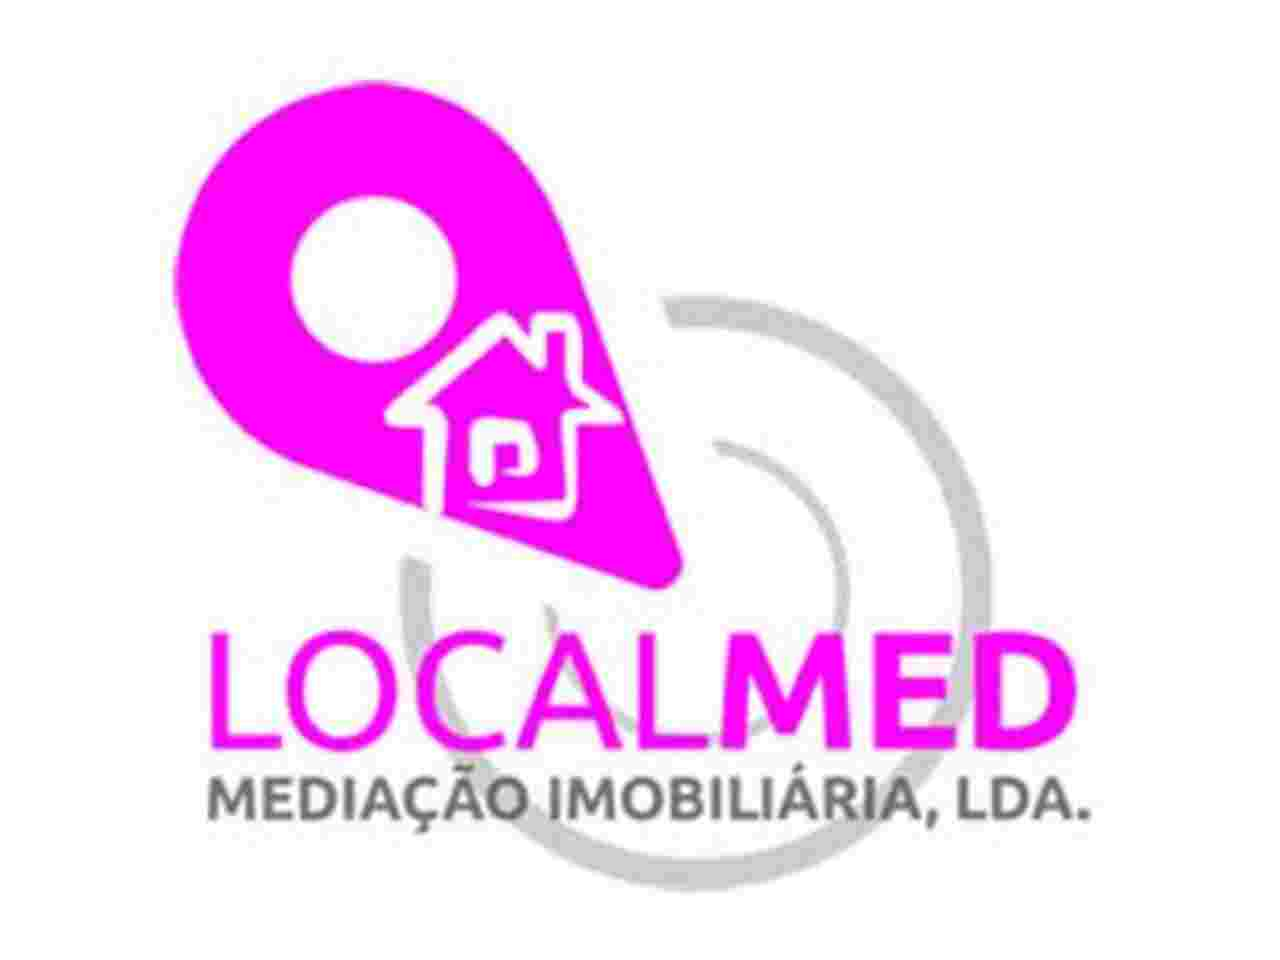 Localstar S.A.